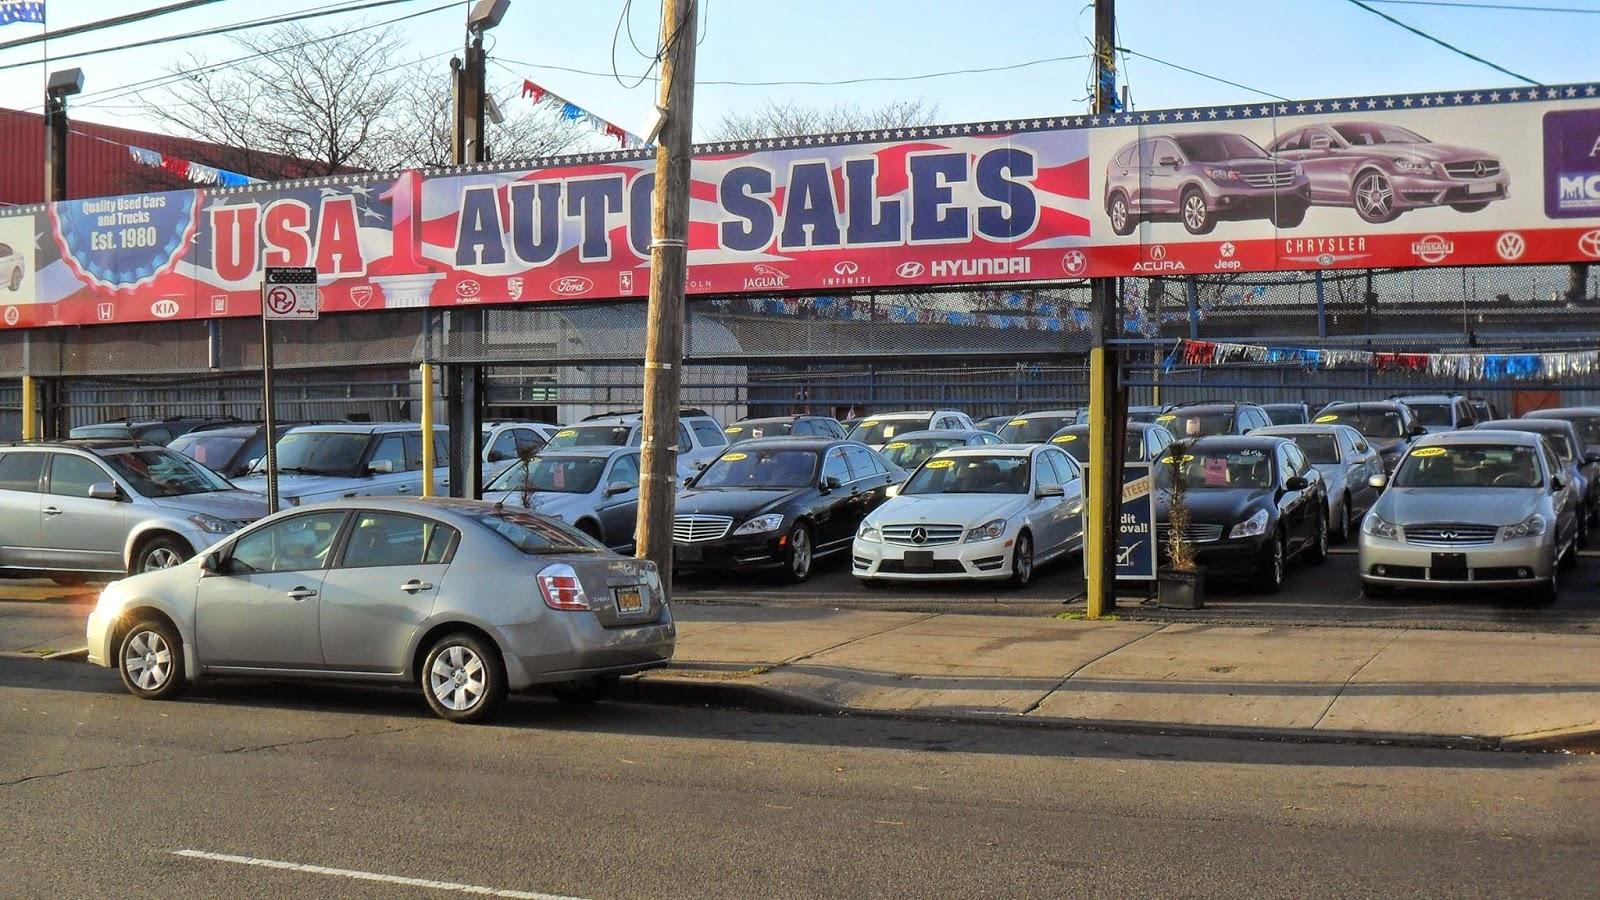 Usa 1 Auto Sales >> Usa 1 Auto Sales Usa 1 Auto Sales